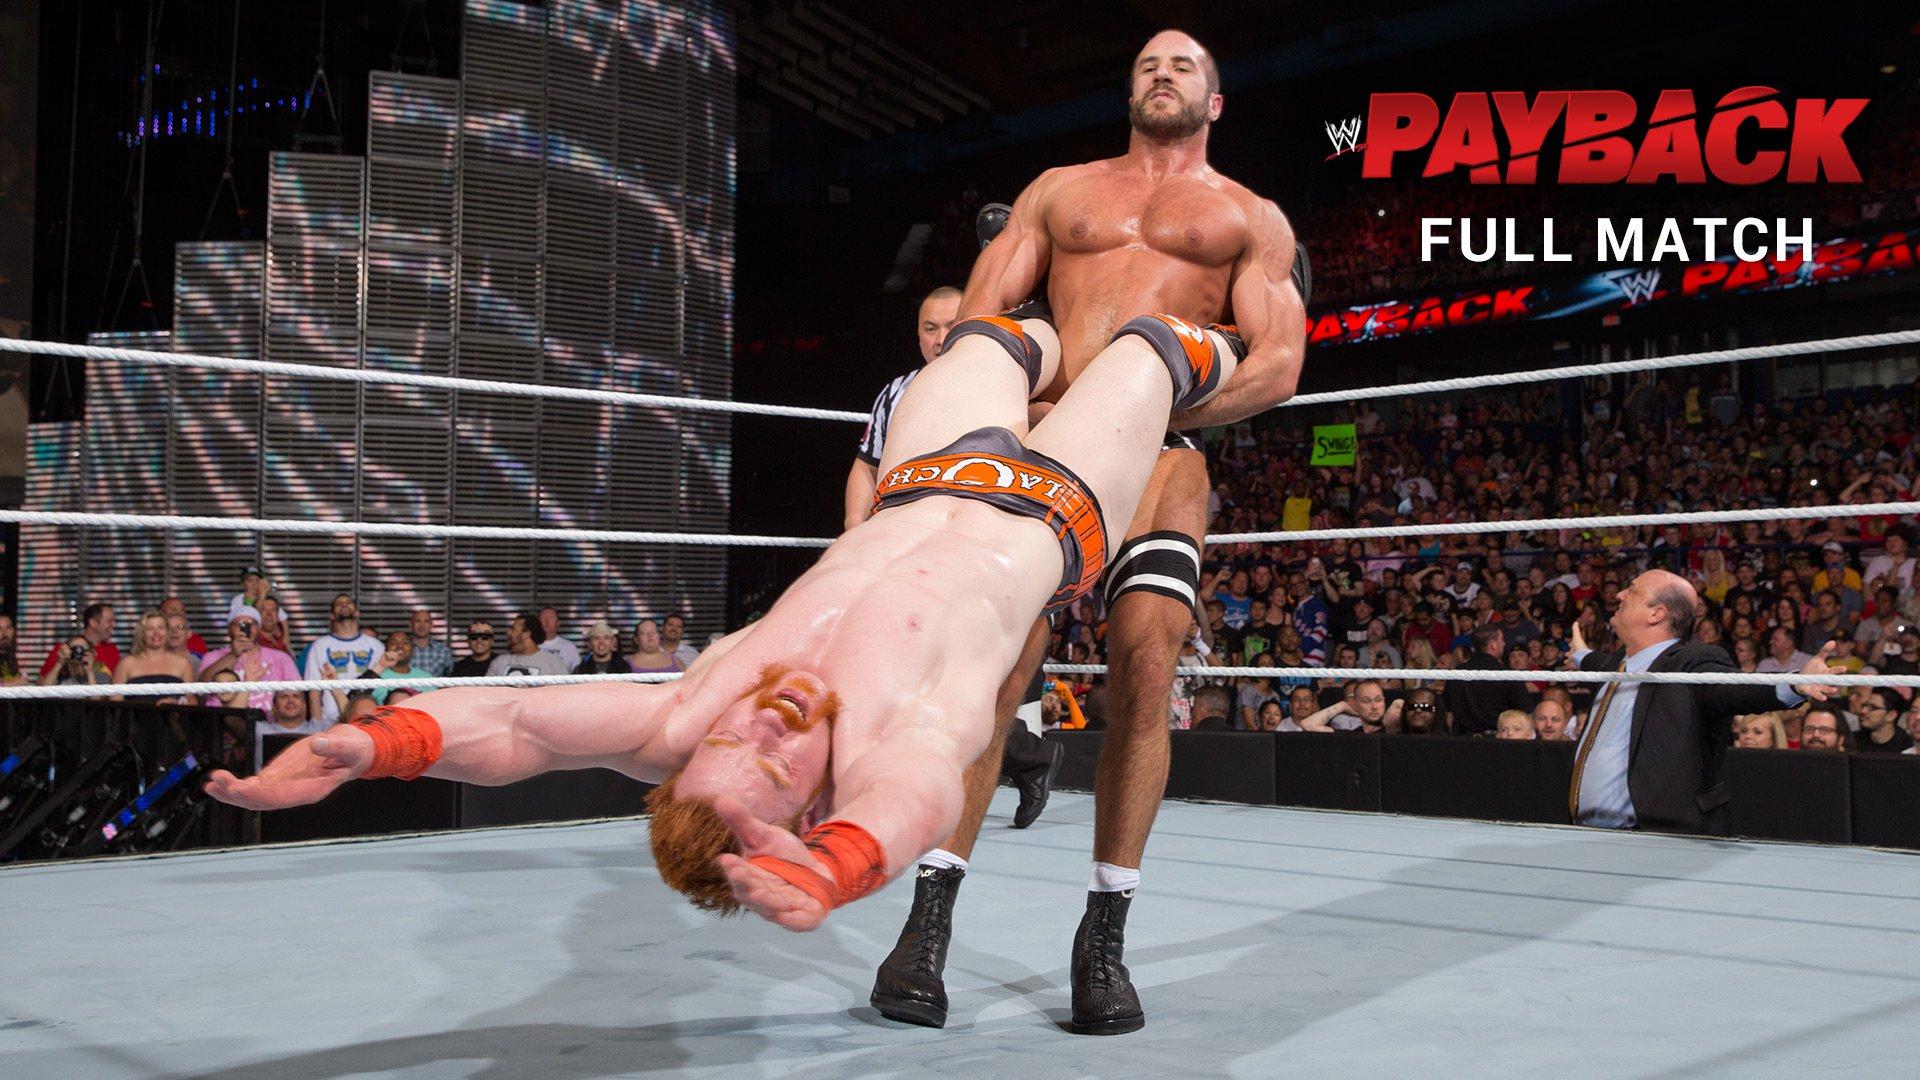 Sheamus vs. Cesaro - Match de Championnat U.S.: WWE Payback 2014 (Match intégral - WWE Network Exclusive)